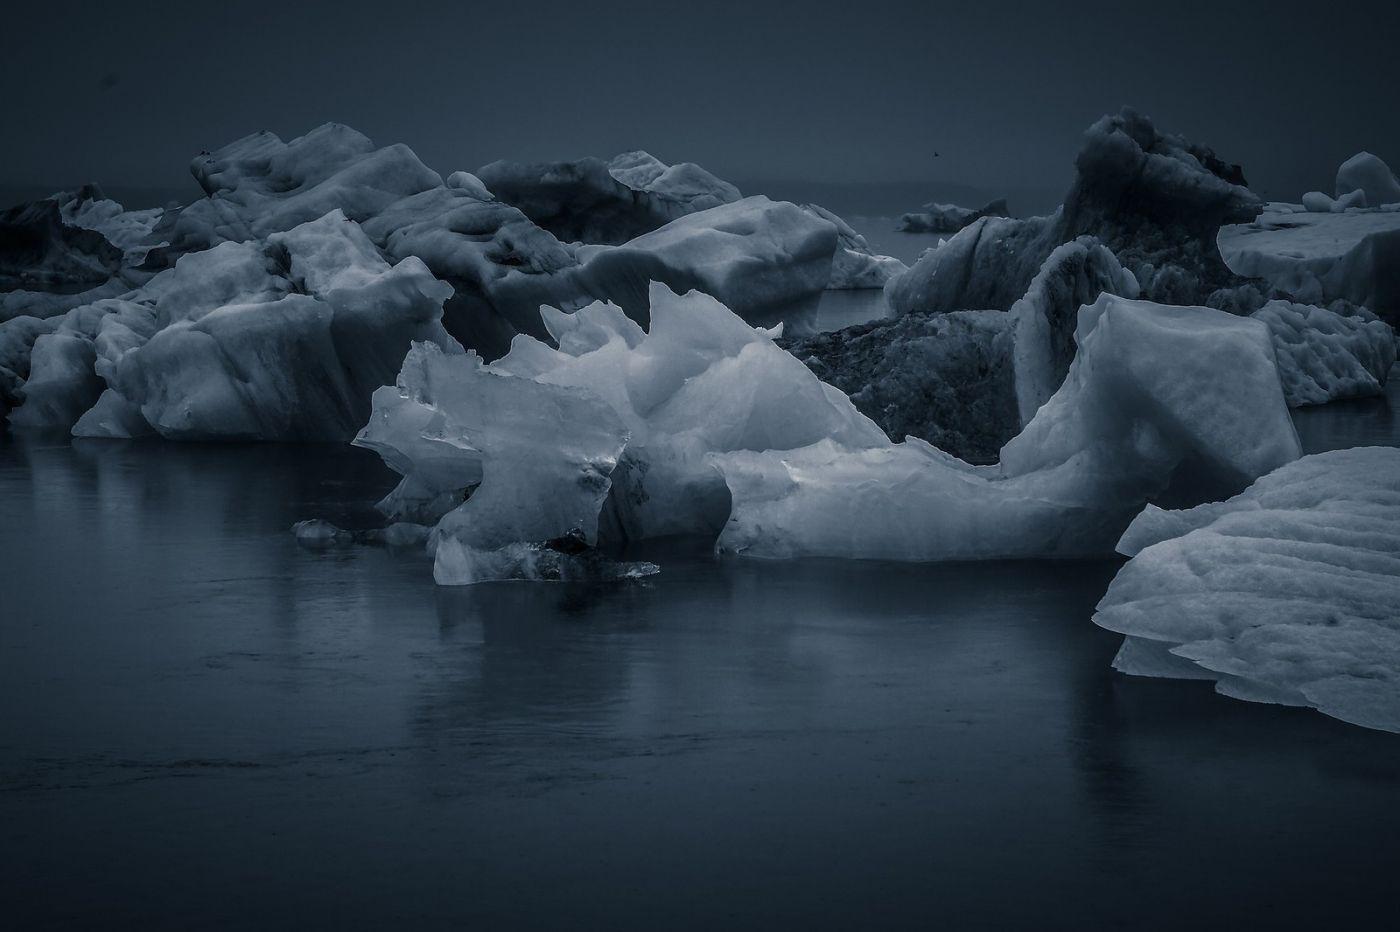 冰岛冰川泻湖(Glacier Lagoon),流动的冰川_图1-30